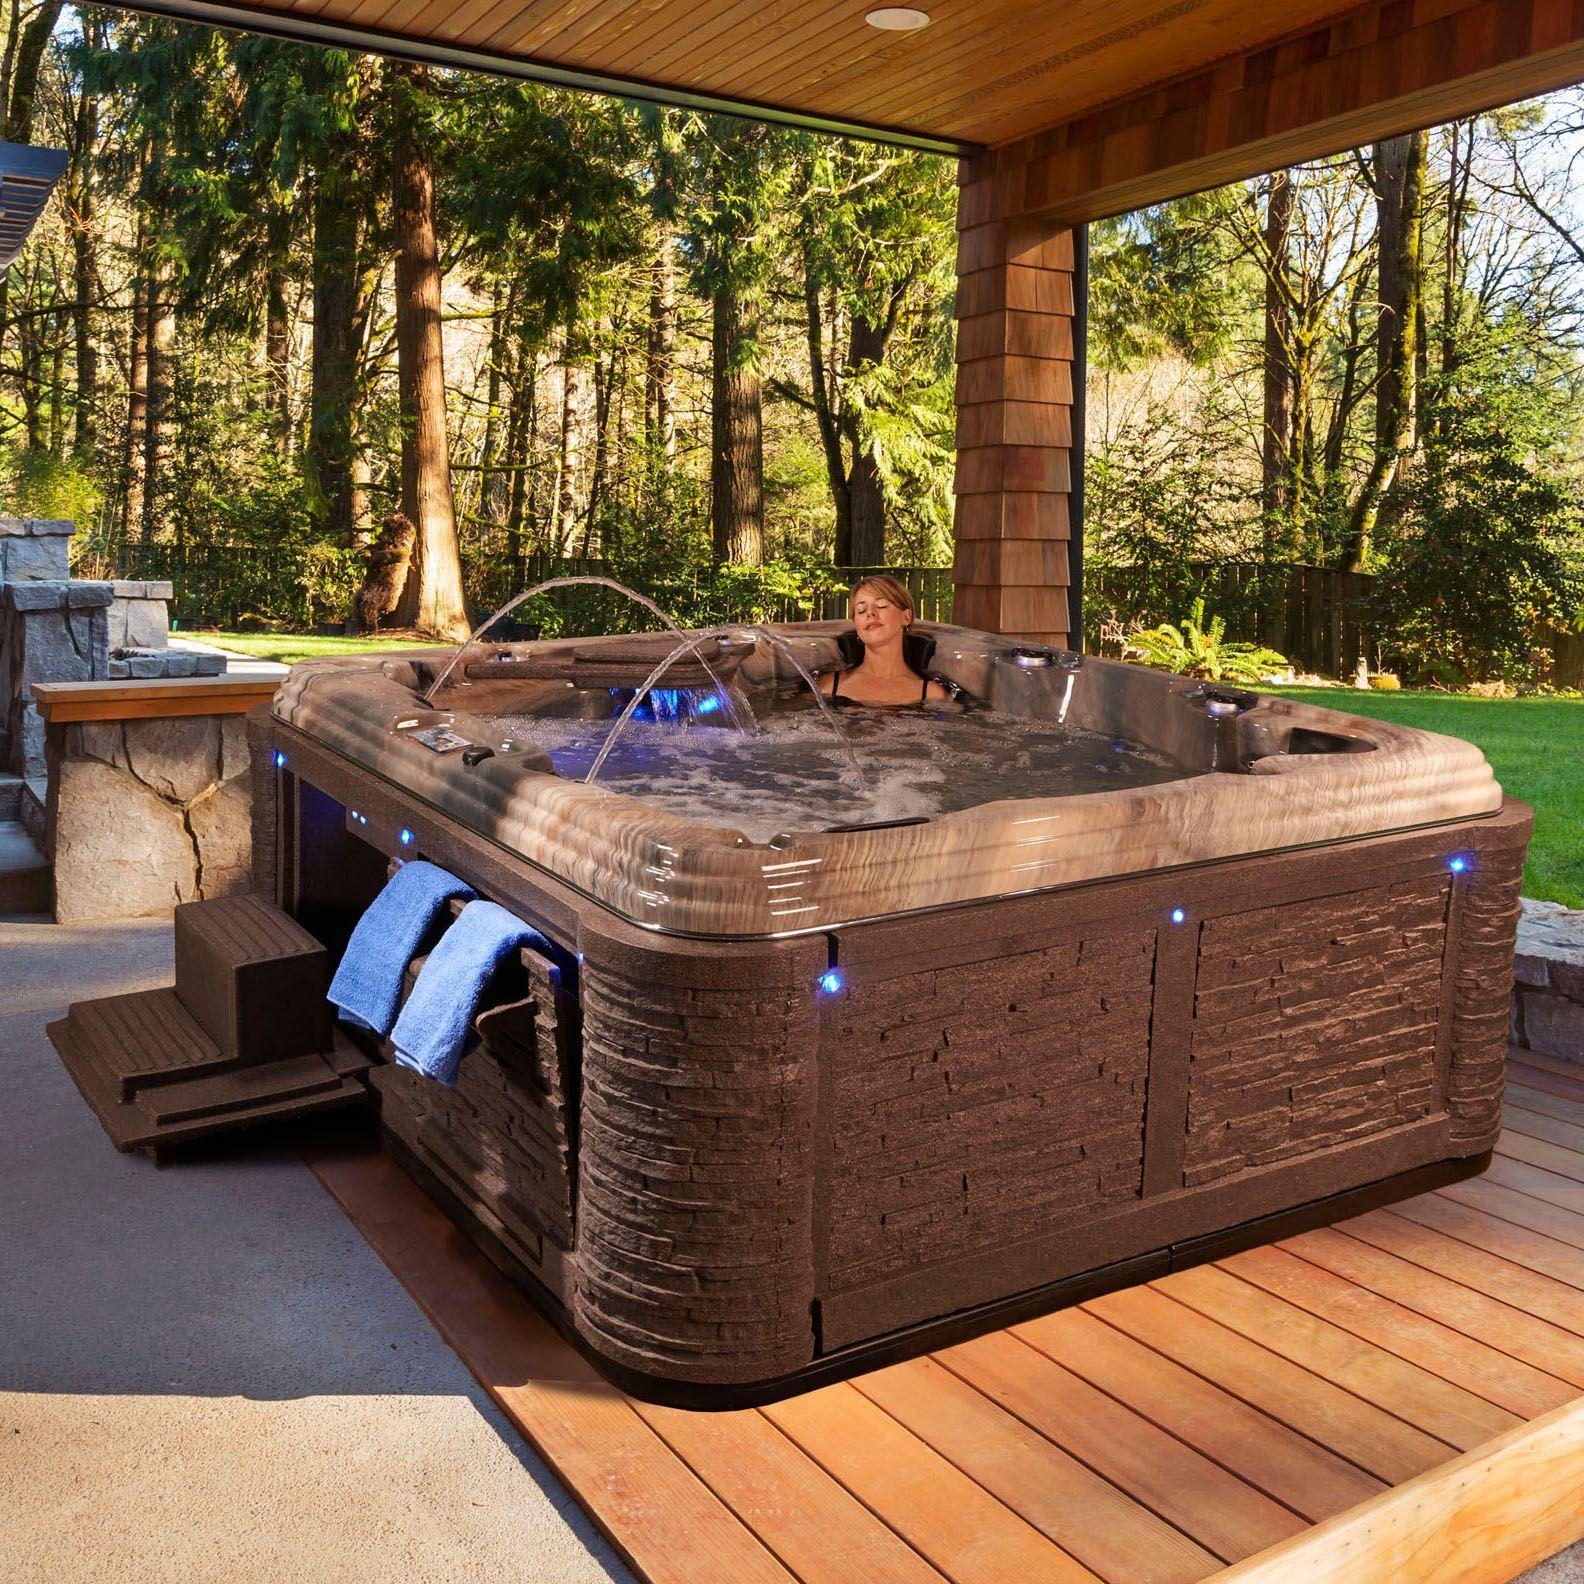 31 strong spas ideas hot tub spa tub